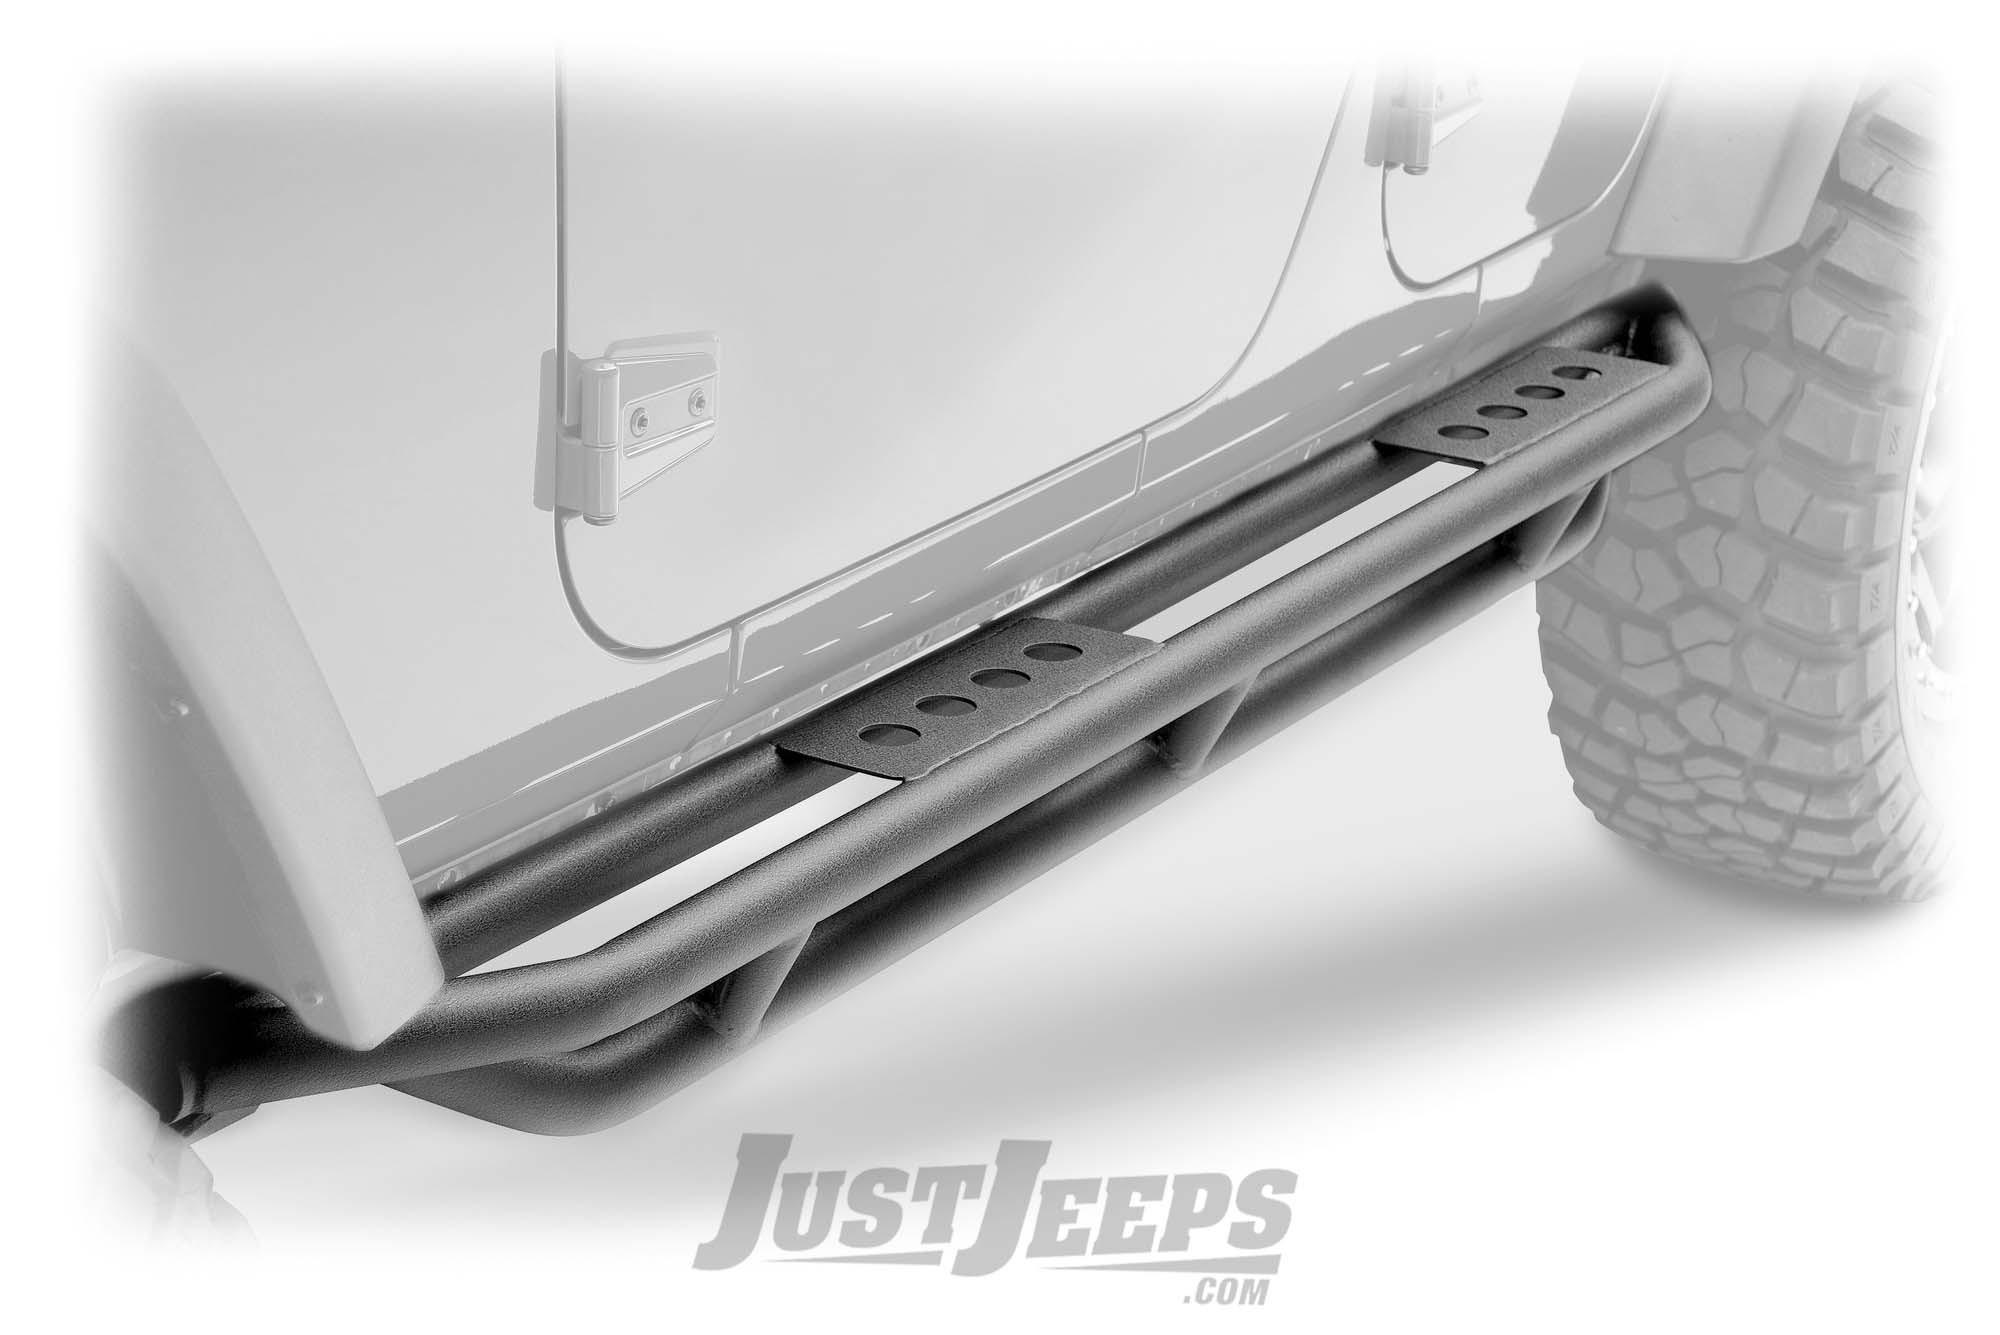 SmittyBilt SRC Side Armor Steps For 2007-18 Jeep Wrangler JK Unlimited 4 Door Models 76634-